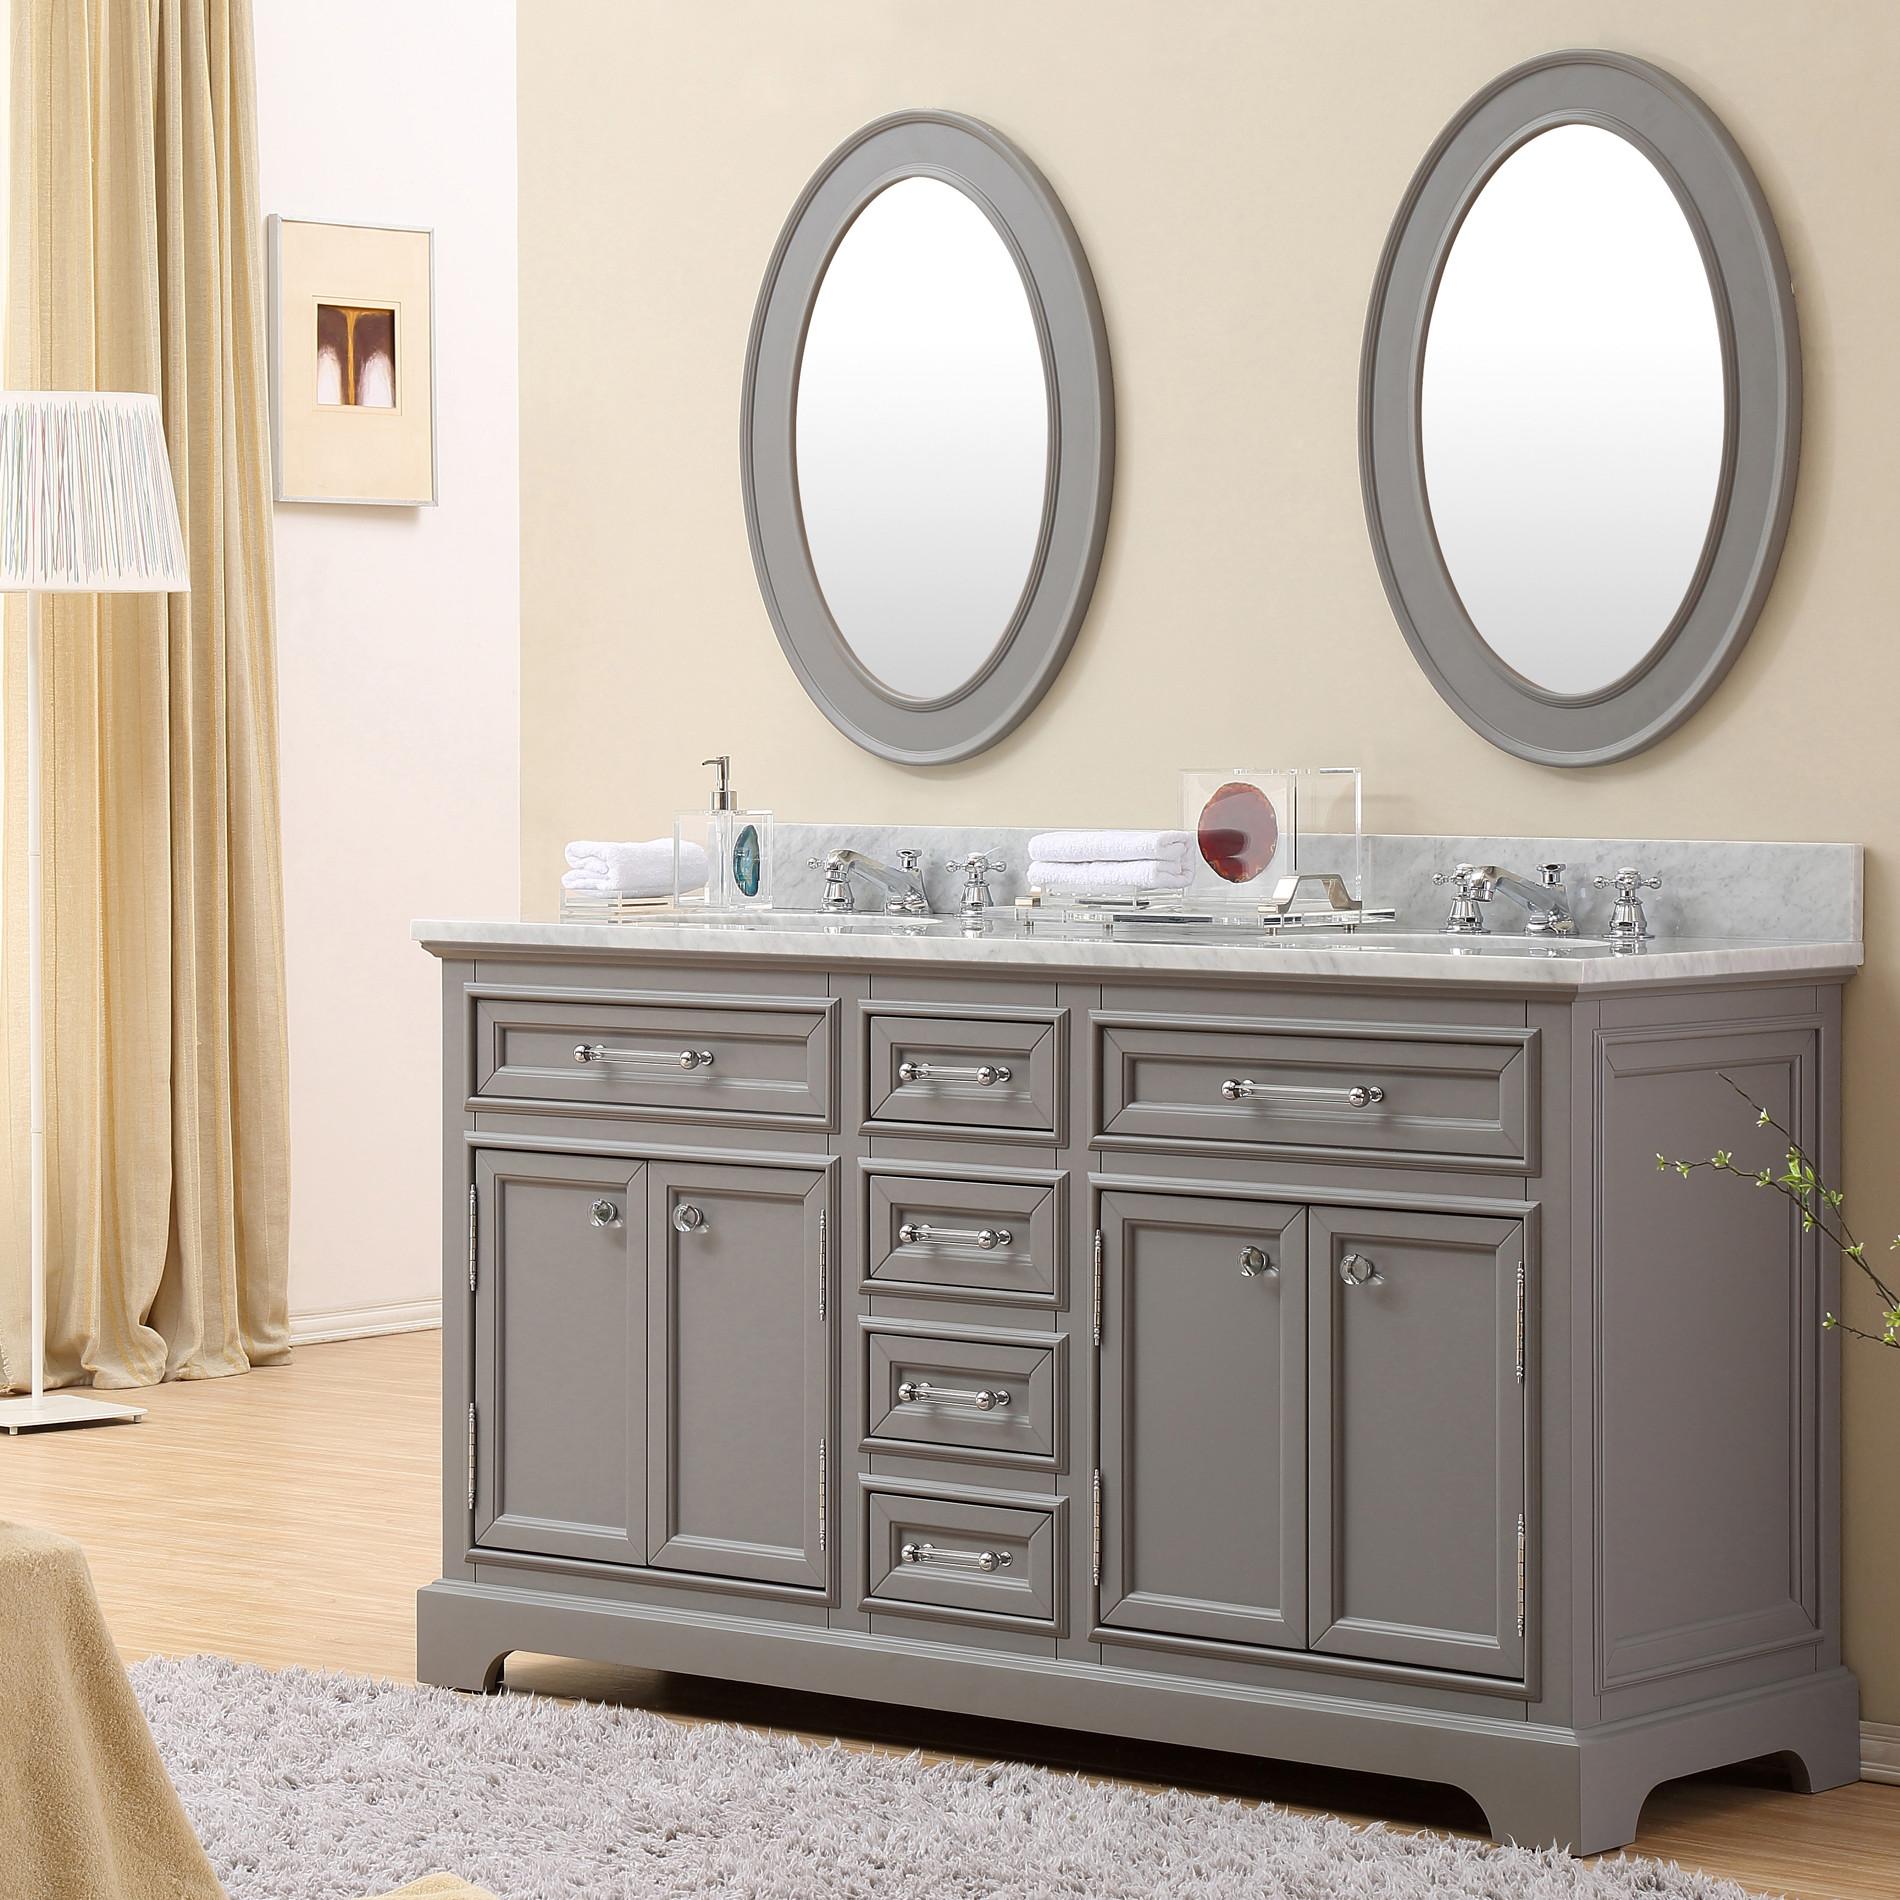 Enjoyable Carenton 72 Inch Traditional Double Sink Bathroom Vanity Home Interior And Landscaping Ferensignezvosmurscom